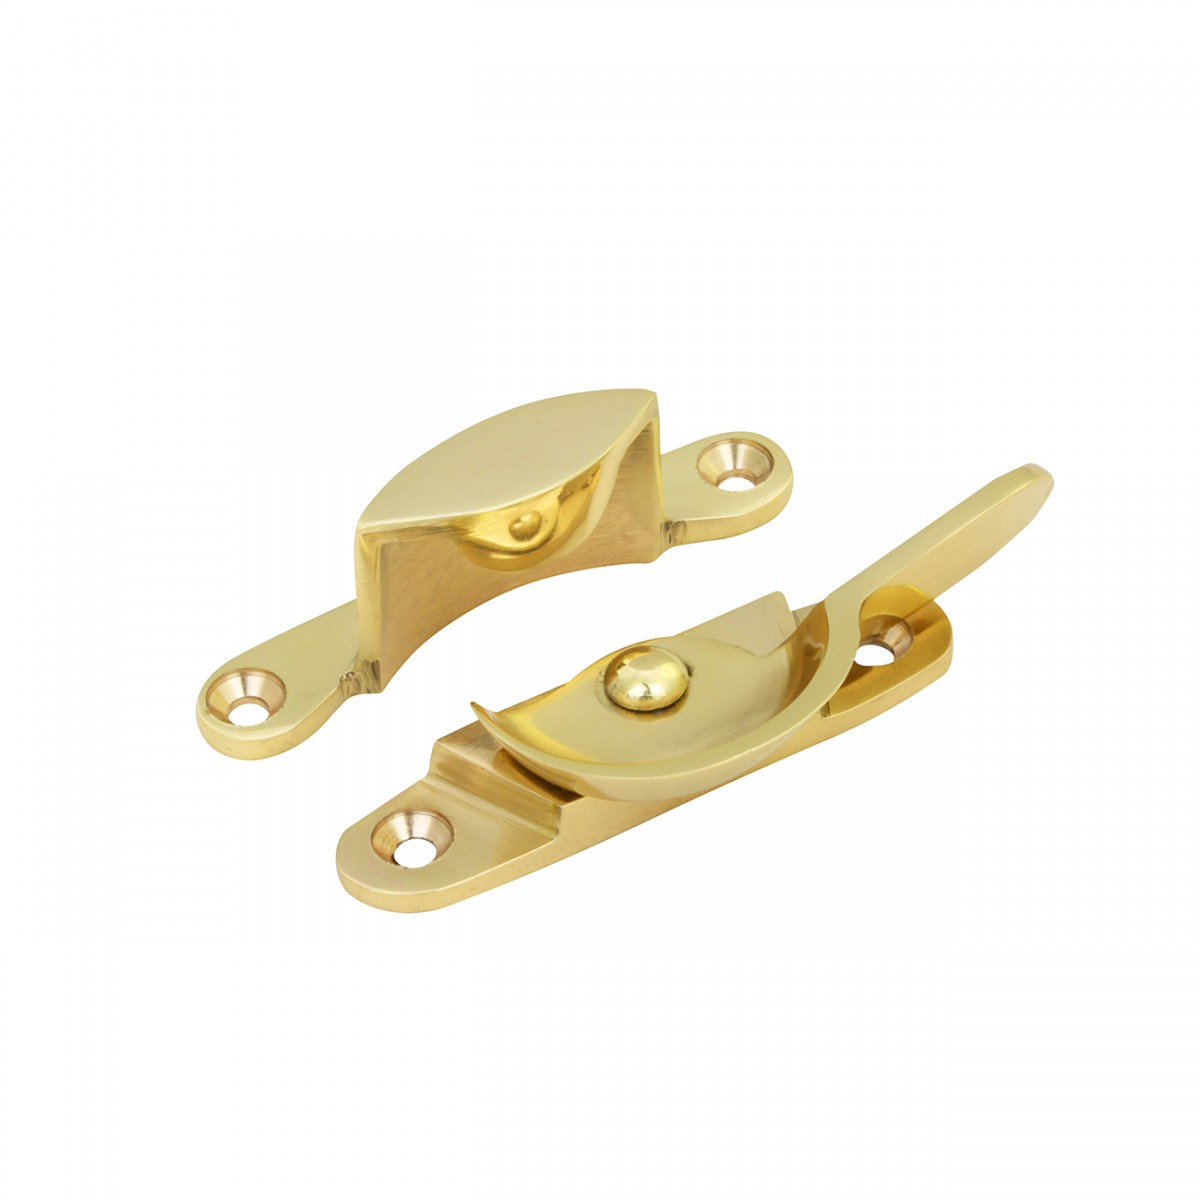 Brass Window Hardware Sash Lock Fastener Lacquered Heavy Duty 2 58 Inches Wide Brass Antique Window Sash Lock Fastener Hardware Traditional Antique Holder Safety